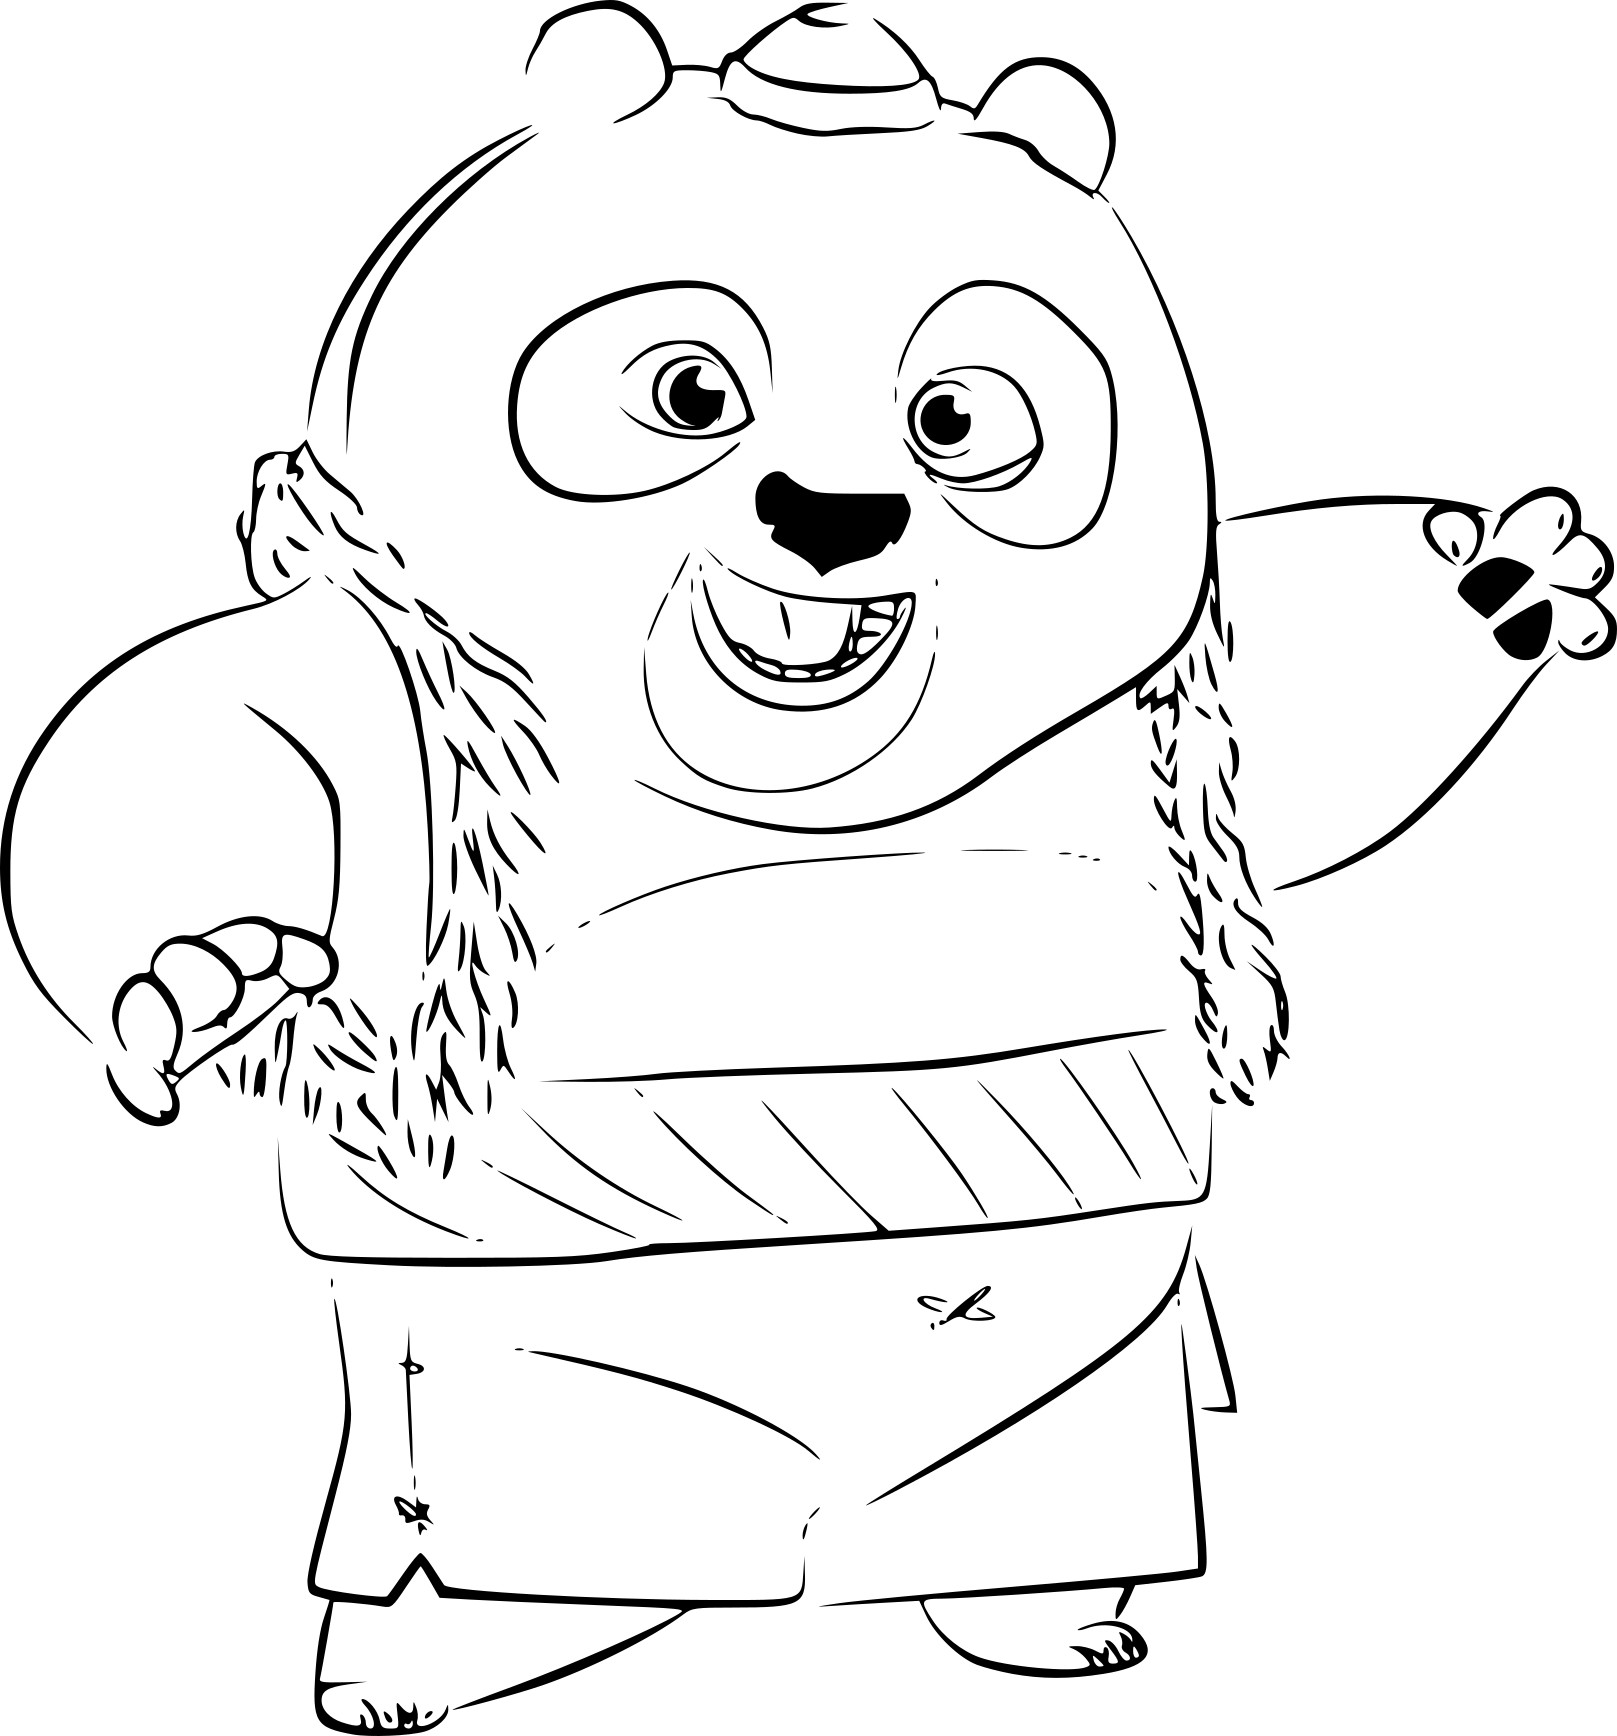 Coloriage bao kung fu panda 3 imprimer - Dessin kung fu panda ...